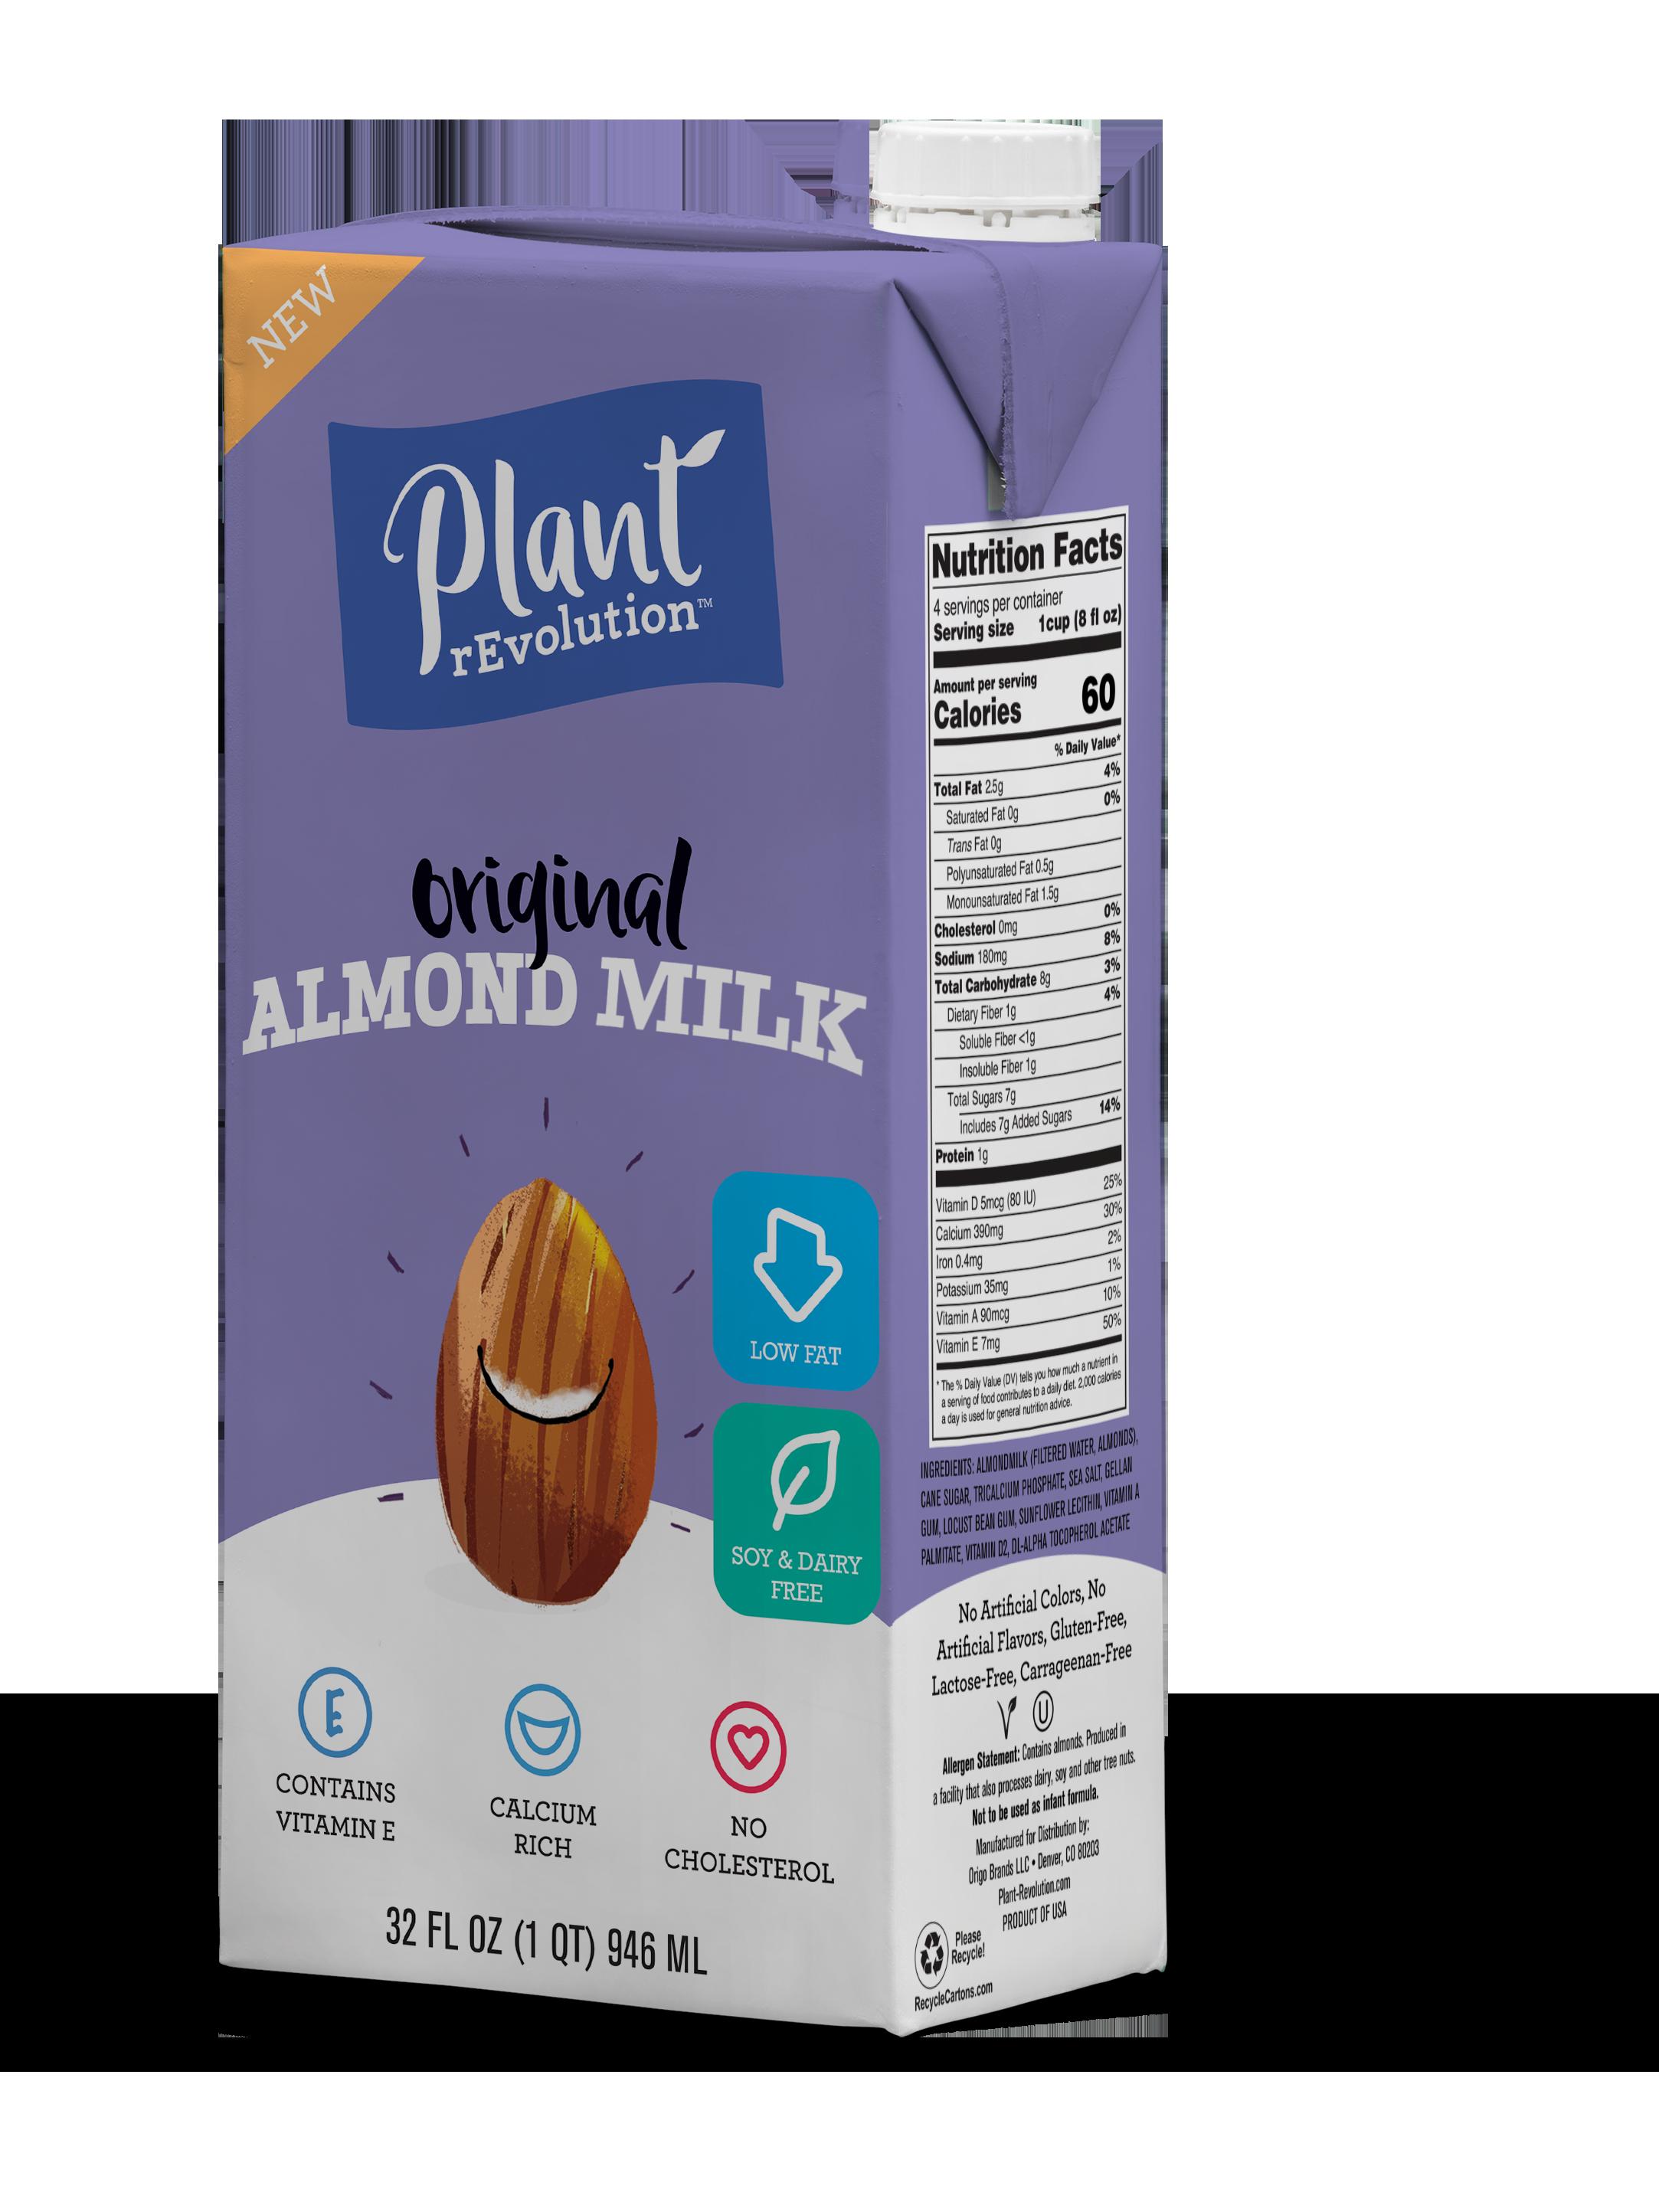 Original Almond Milk — Plant rEvolution